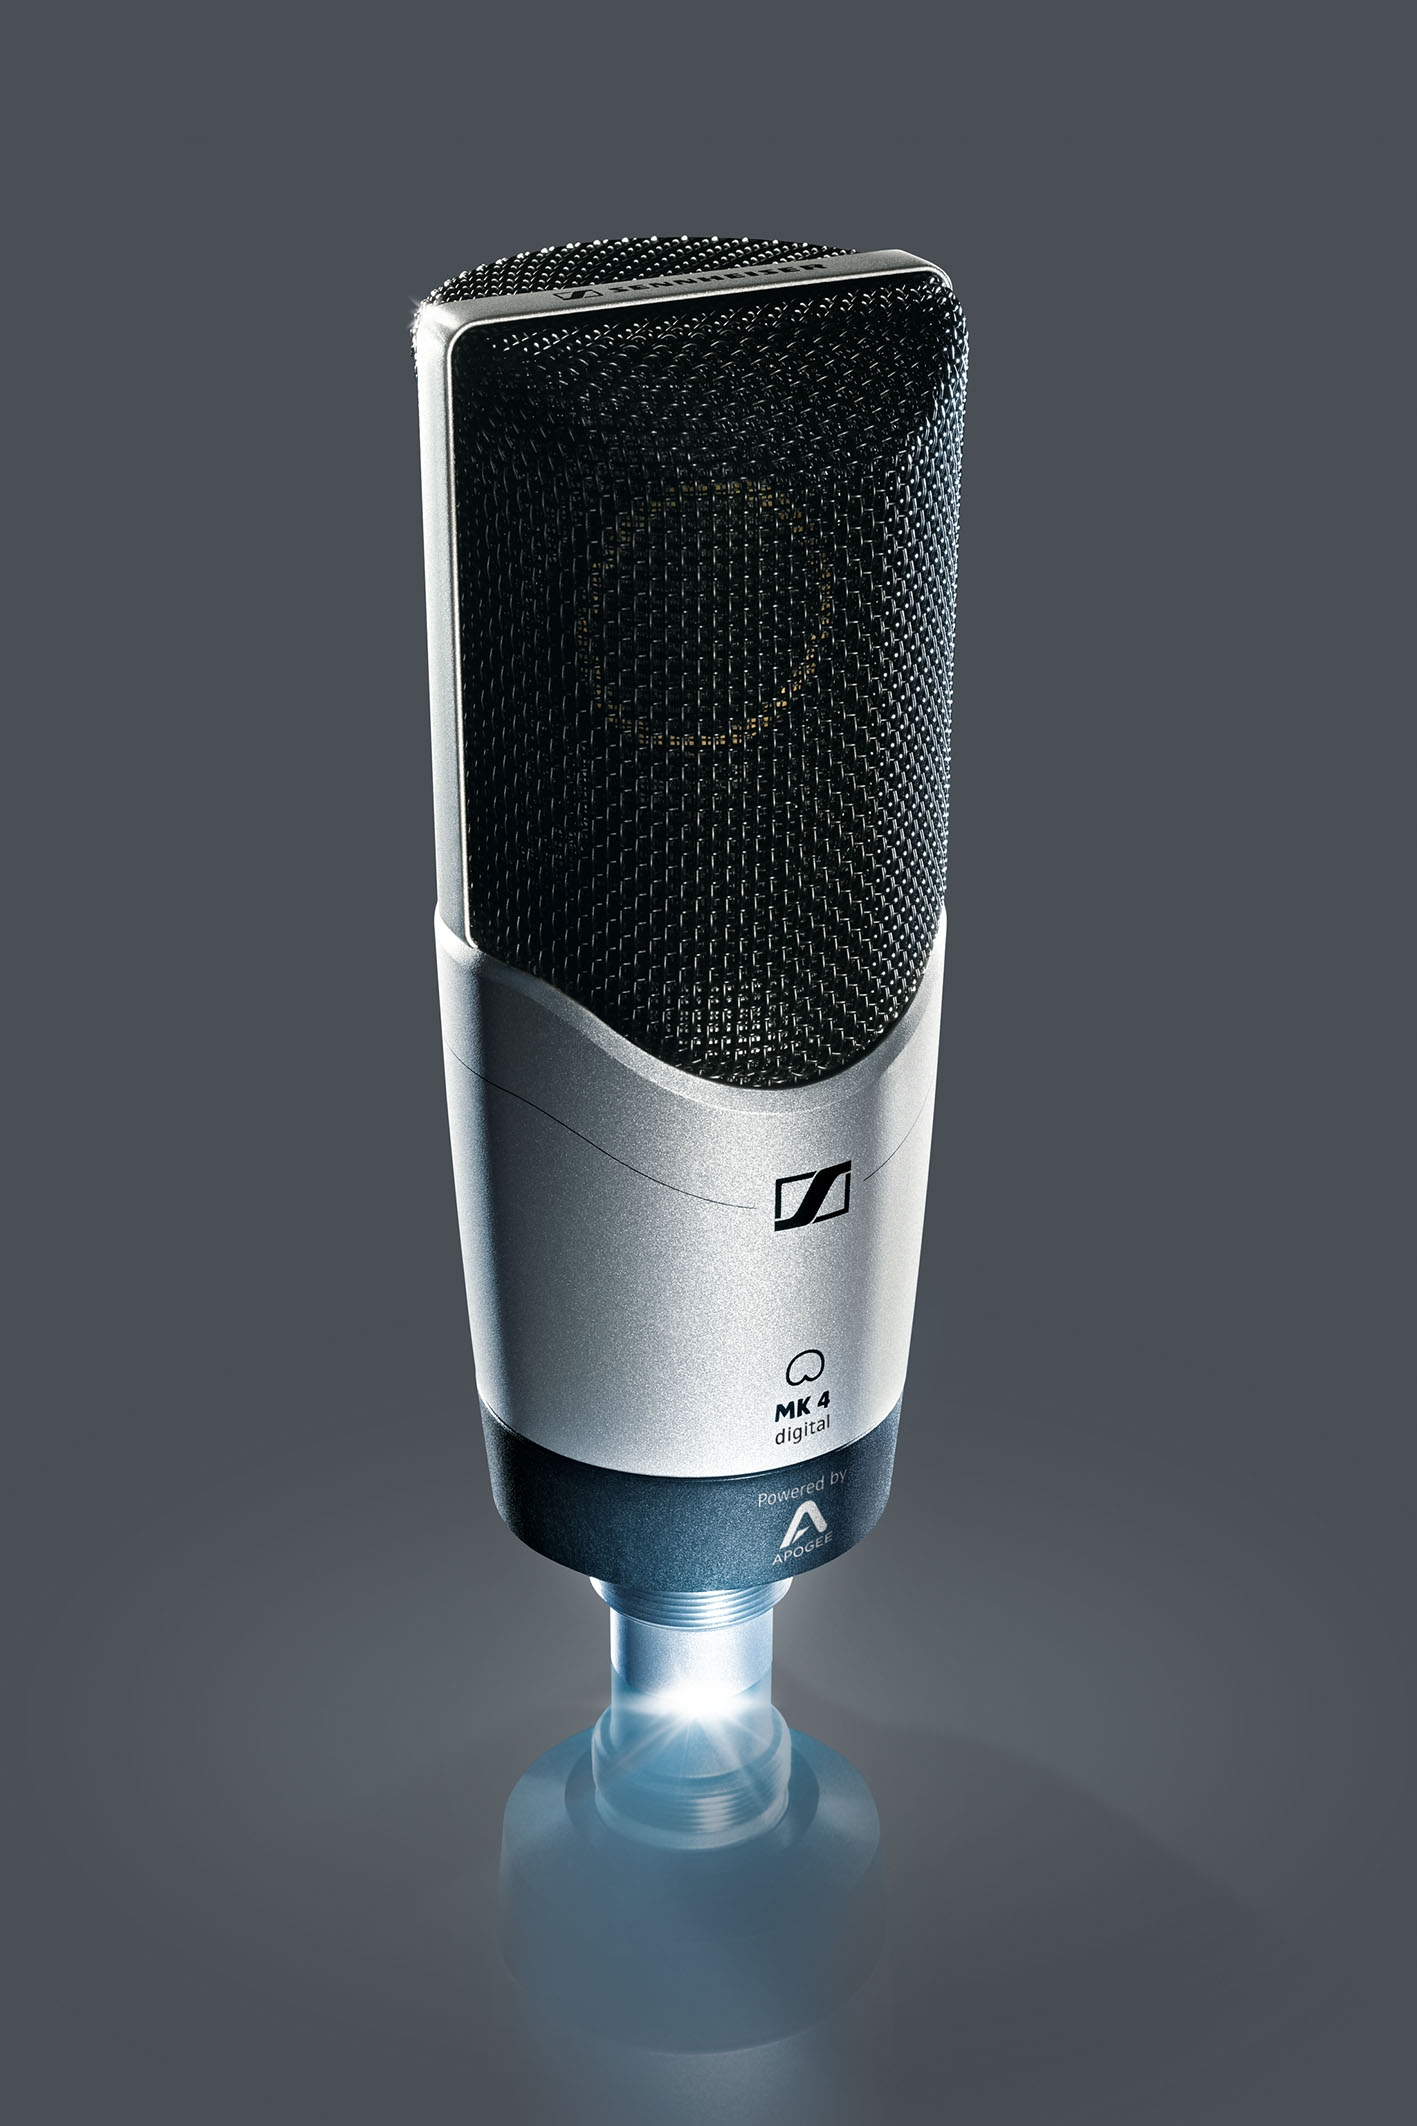 MK 4 digital 可直接连接到 iOS 设备,Mac 和 PC 计算机。大振膜 MK 4 digital 非常适合于与任意需要高声音品质的移动录音任务搭配,具有真正电容话筒的典型温暖和细节。  在法兰克福 prolight + sound 展,Sennheiser 将展示新的 MK 4 的数字版,MK 4 是 Sennheiser 最受欢迎的录音话筒之一。通过高品质的 Apogee A/D 转换器和话筒前置放大器技术,MK 4 digital 可直接连接到 iOS 设备,Mac 和 PC 计算机。